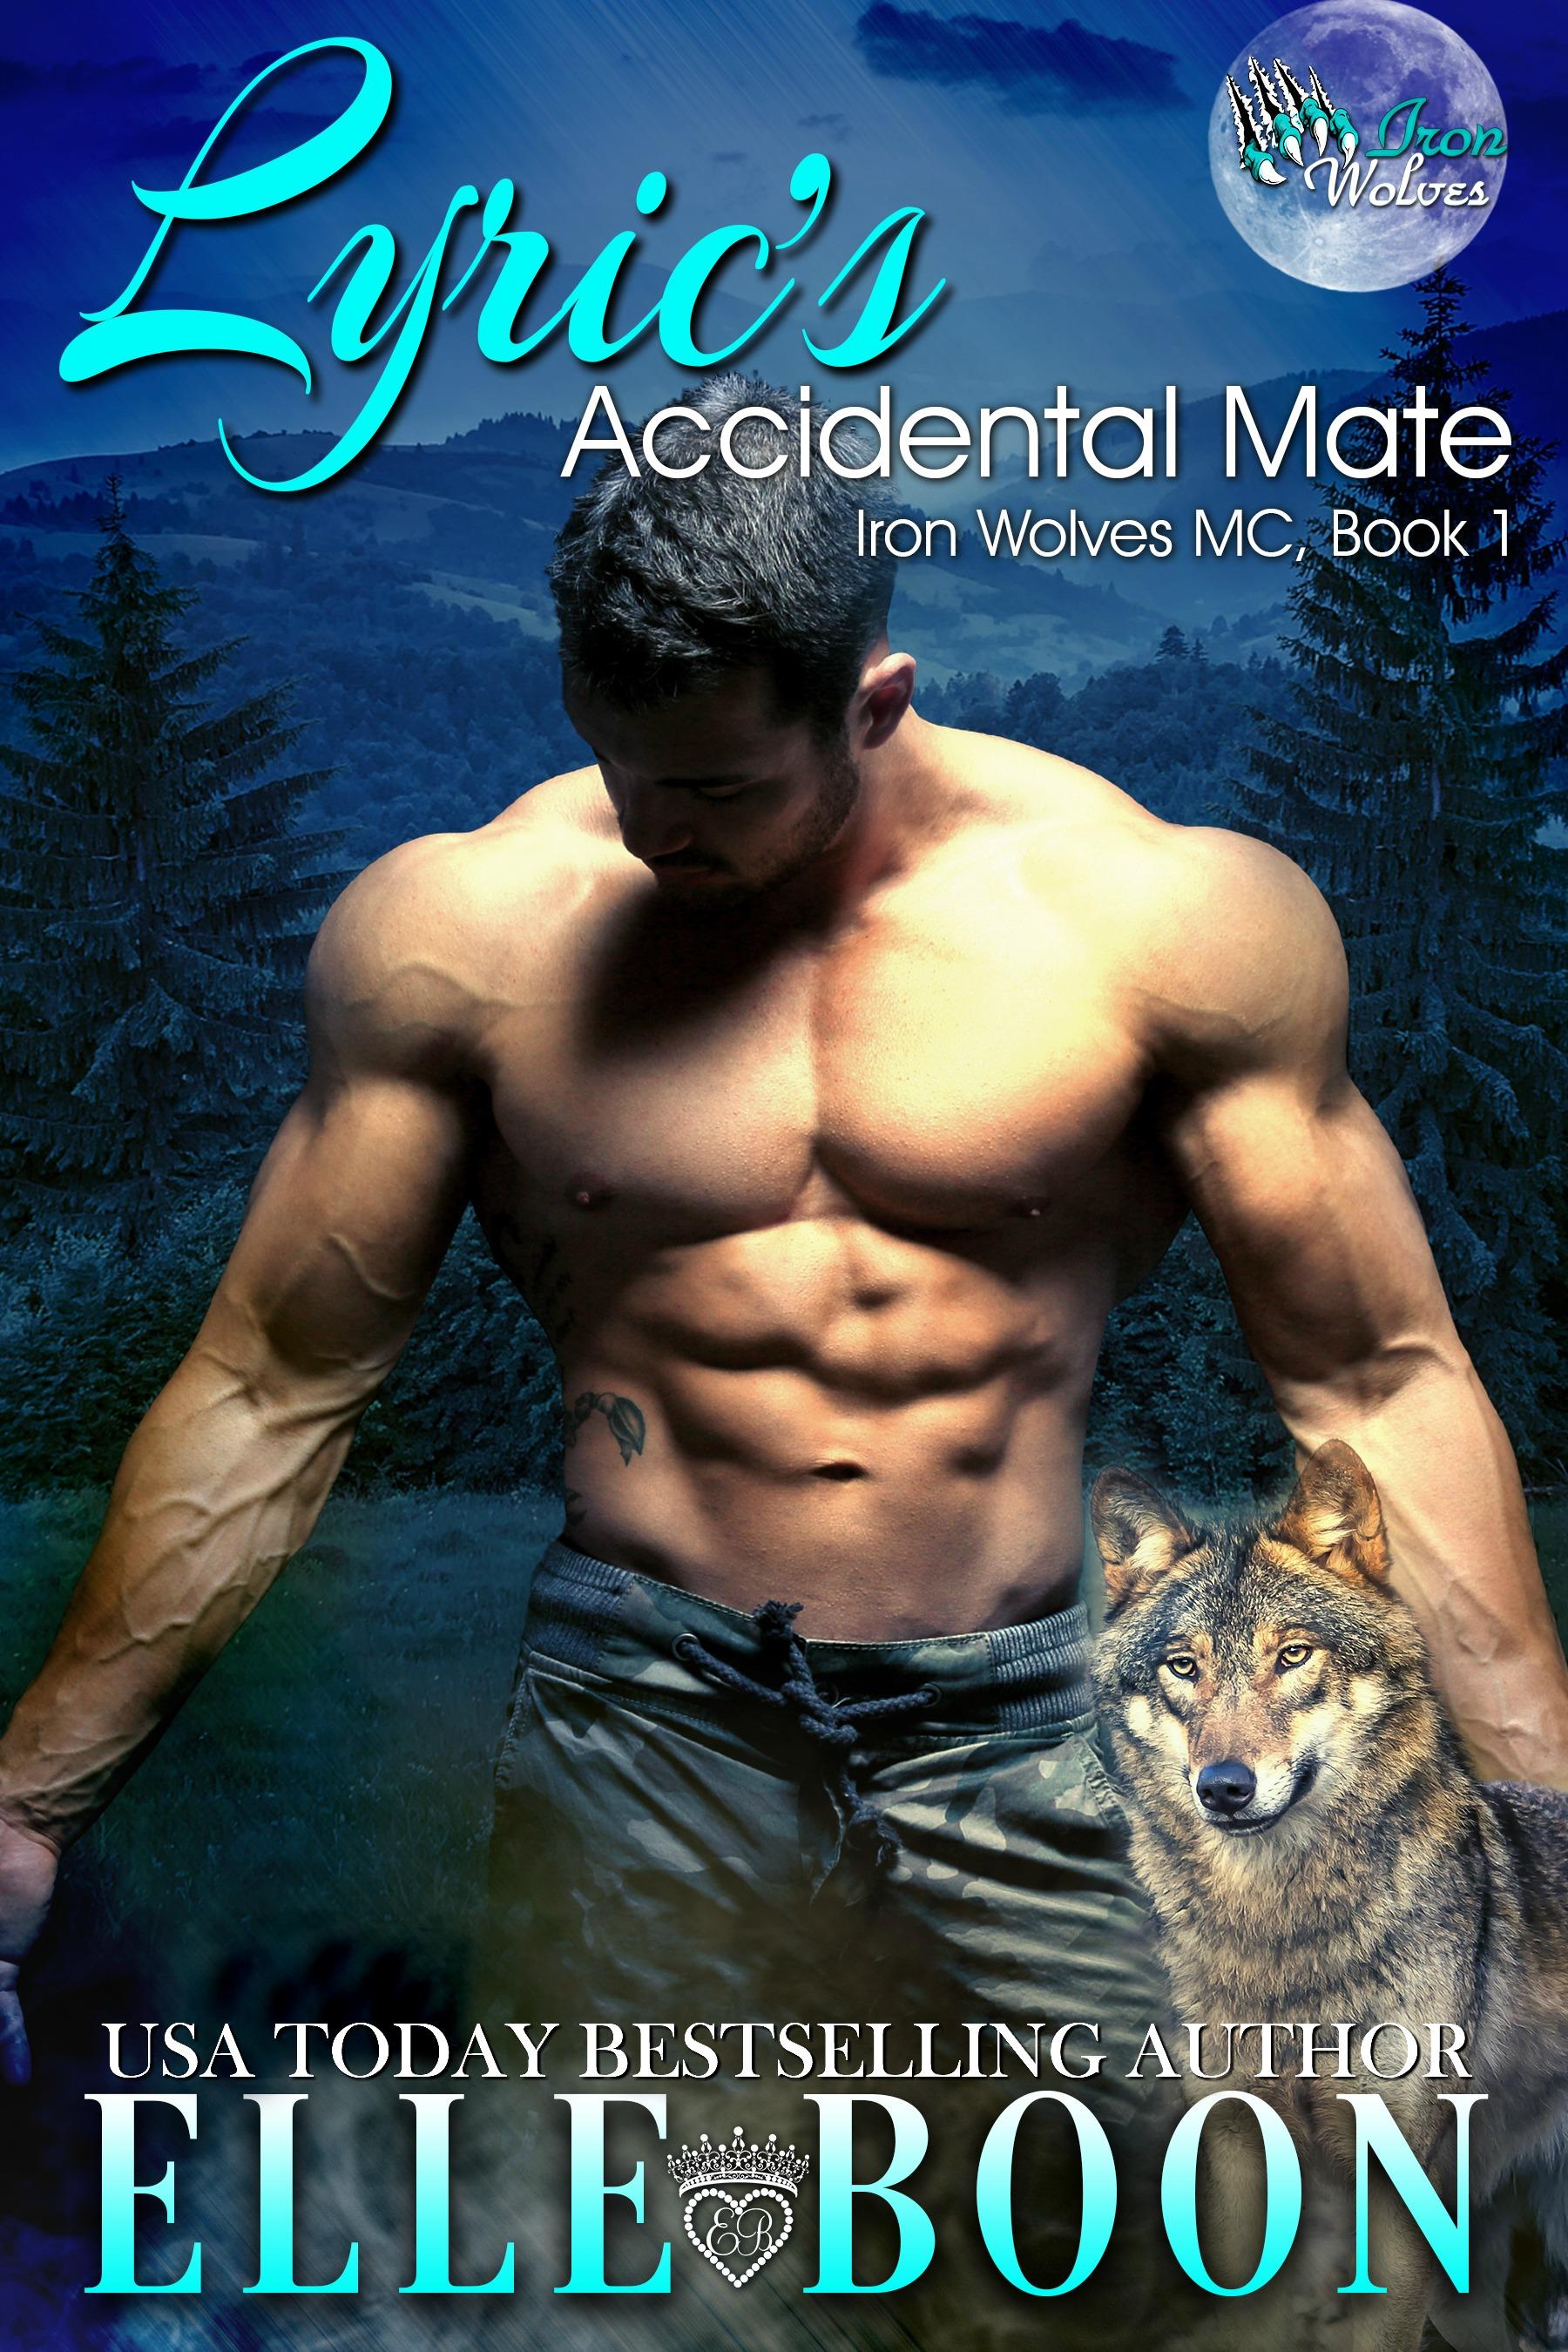 Smashwords – Lyric's Accidental Mate, Iron Wolves MC Book 1 – a book